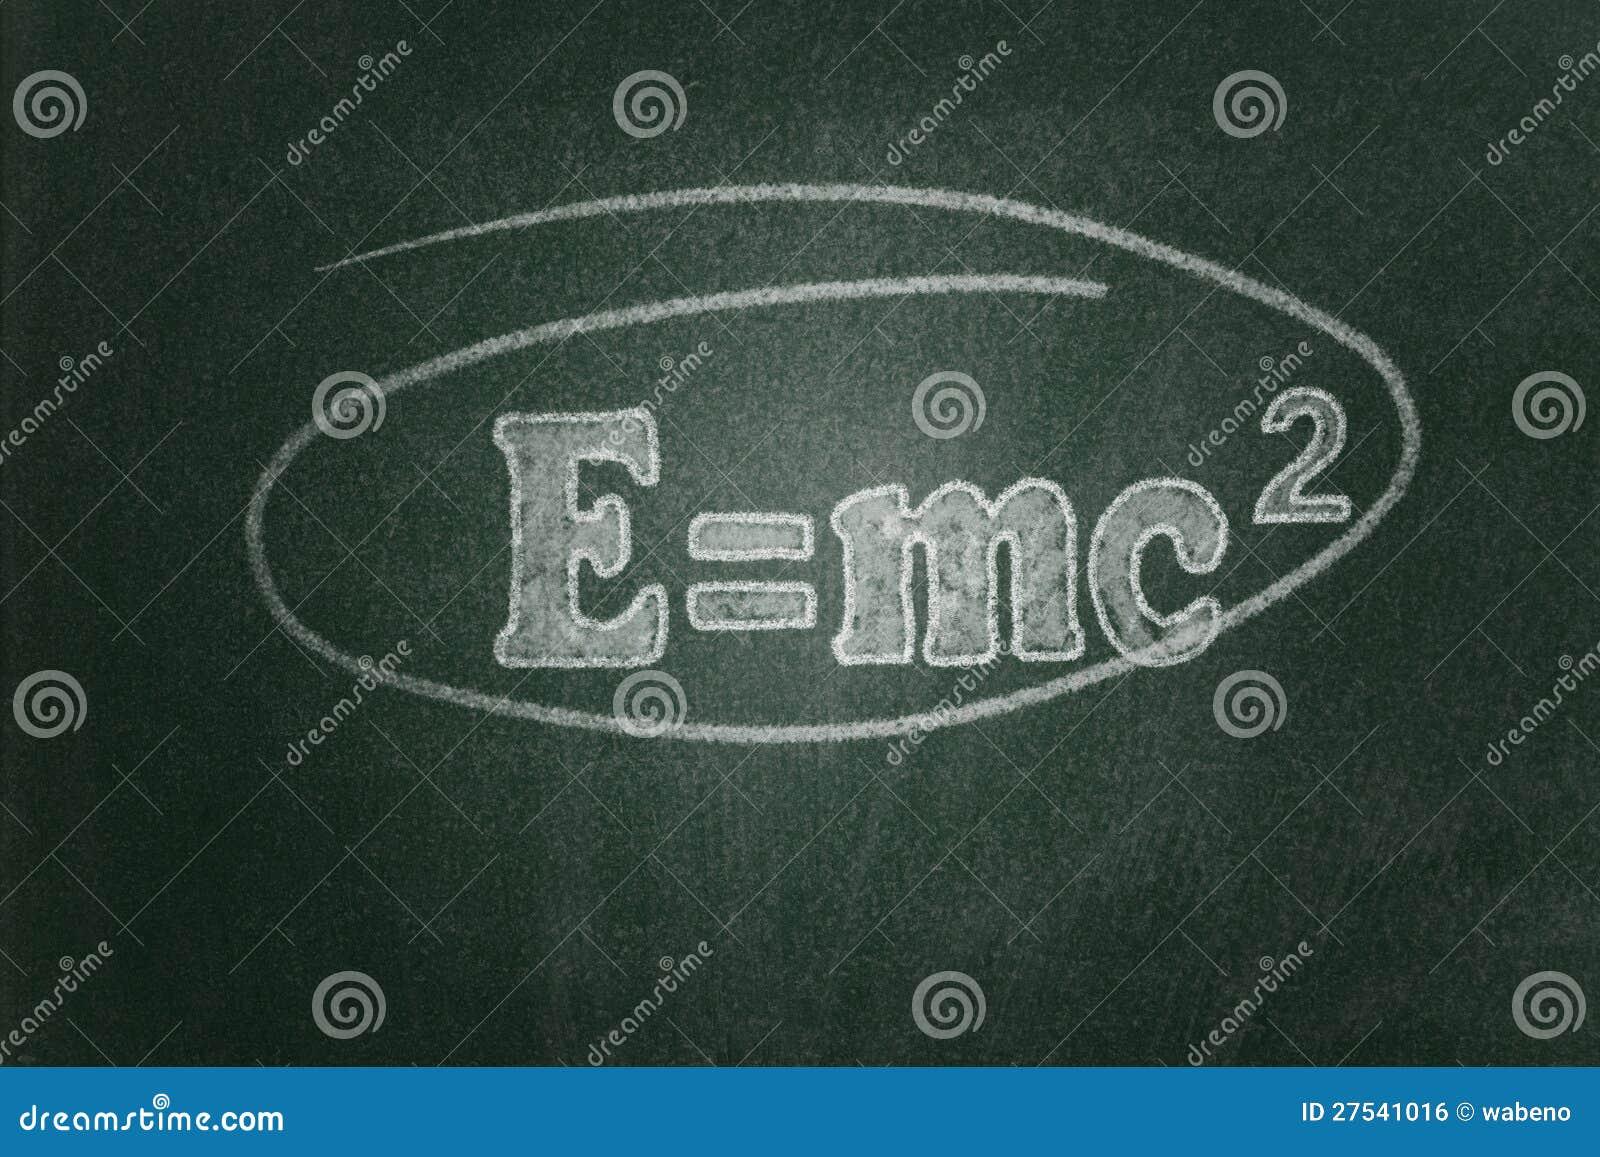 albert einstein theory of relativity time travel pdf